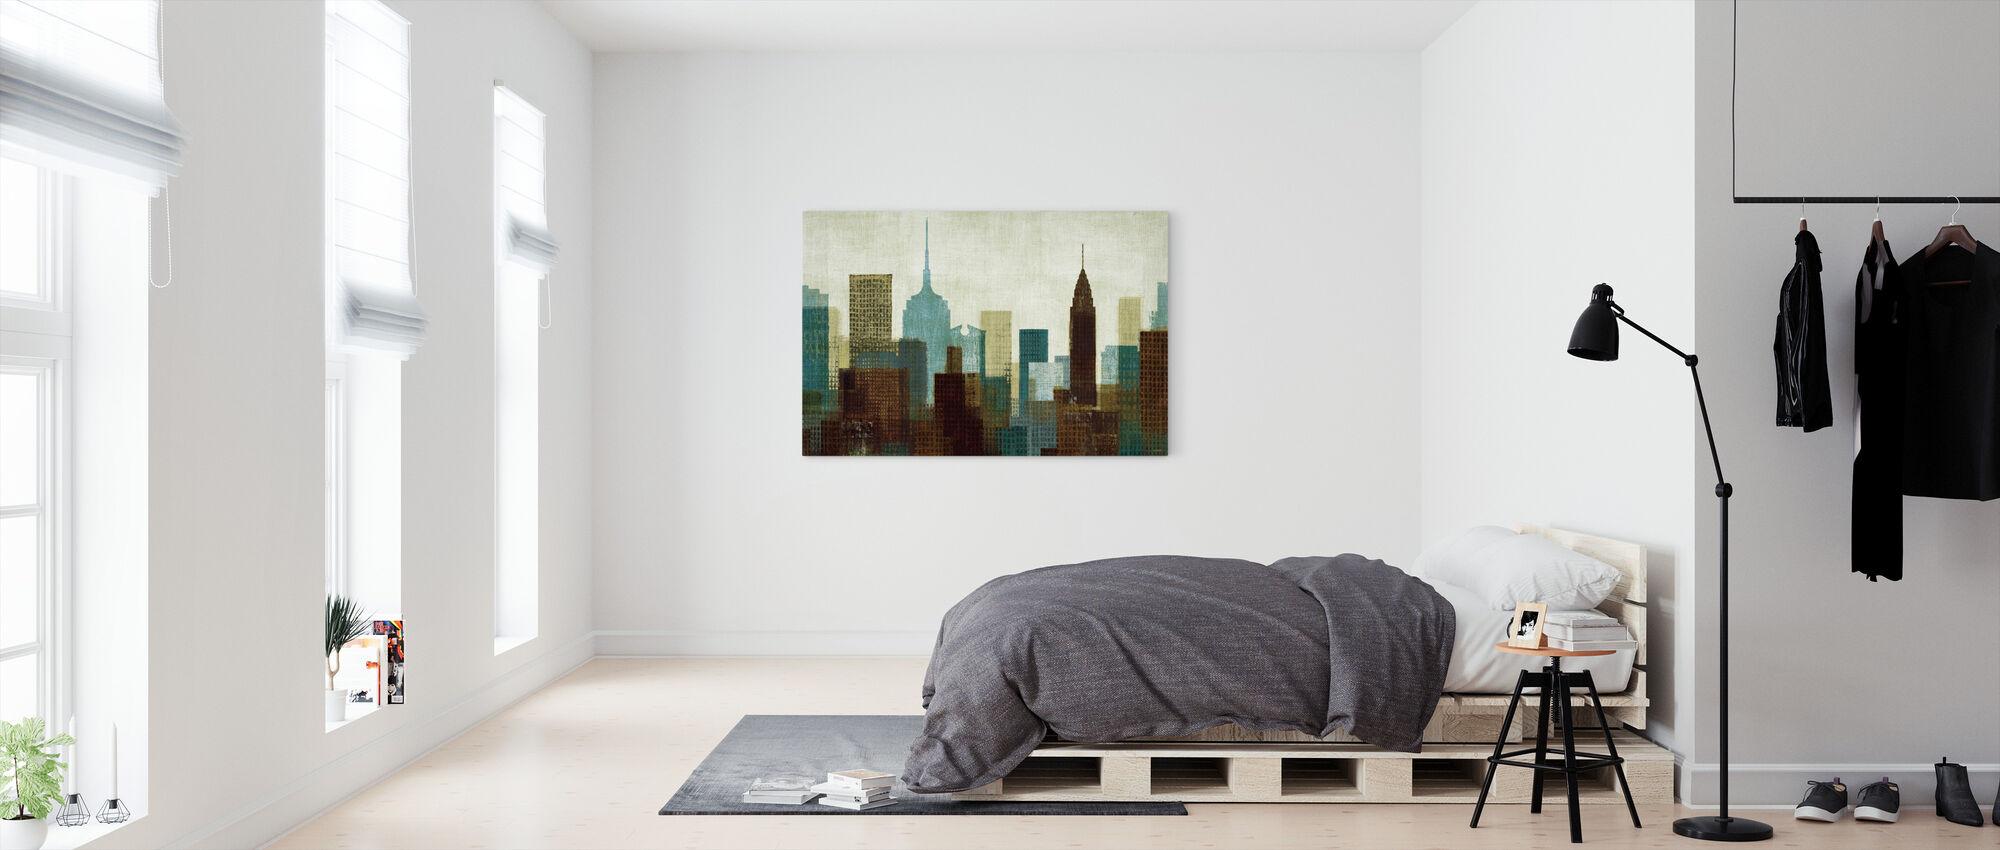 Zomer in de Stad I Blauw - Canvas print - Slaapkamer